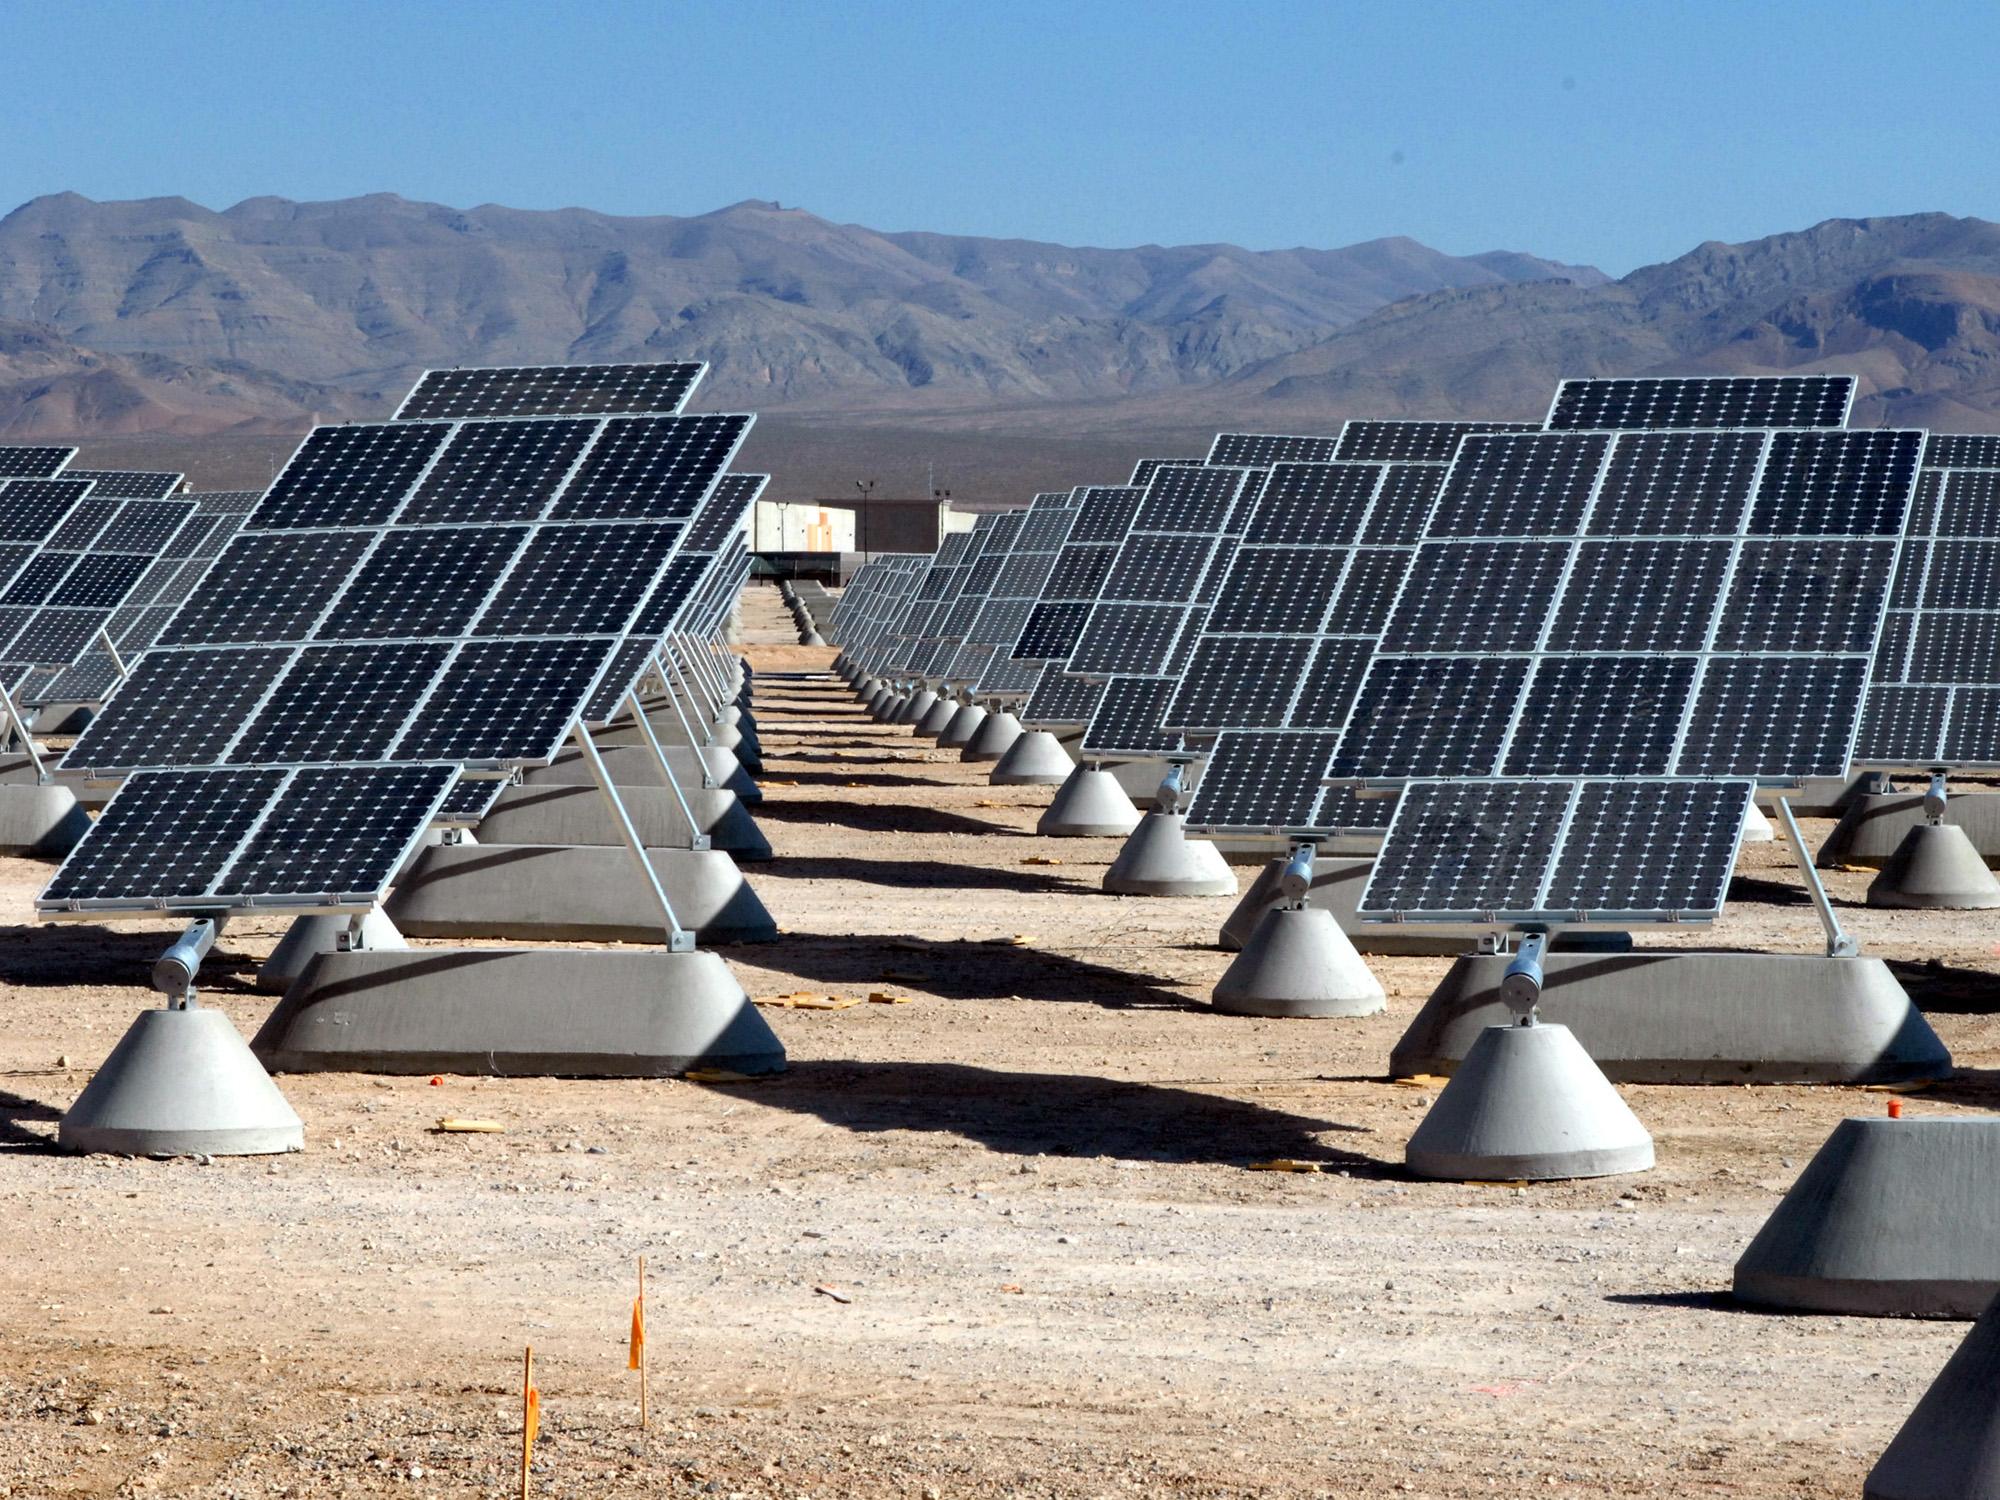 Feds spotlight 2 Az sites for solar projects